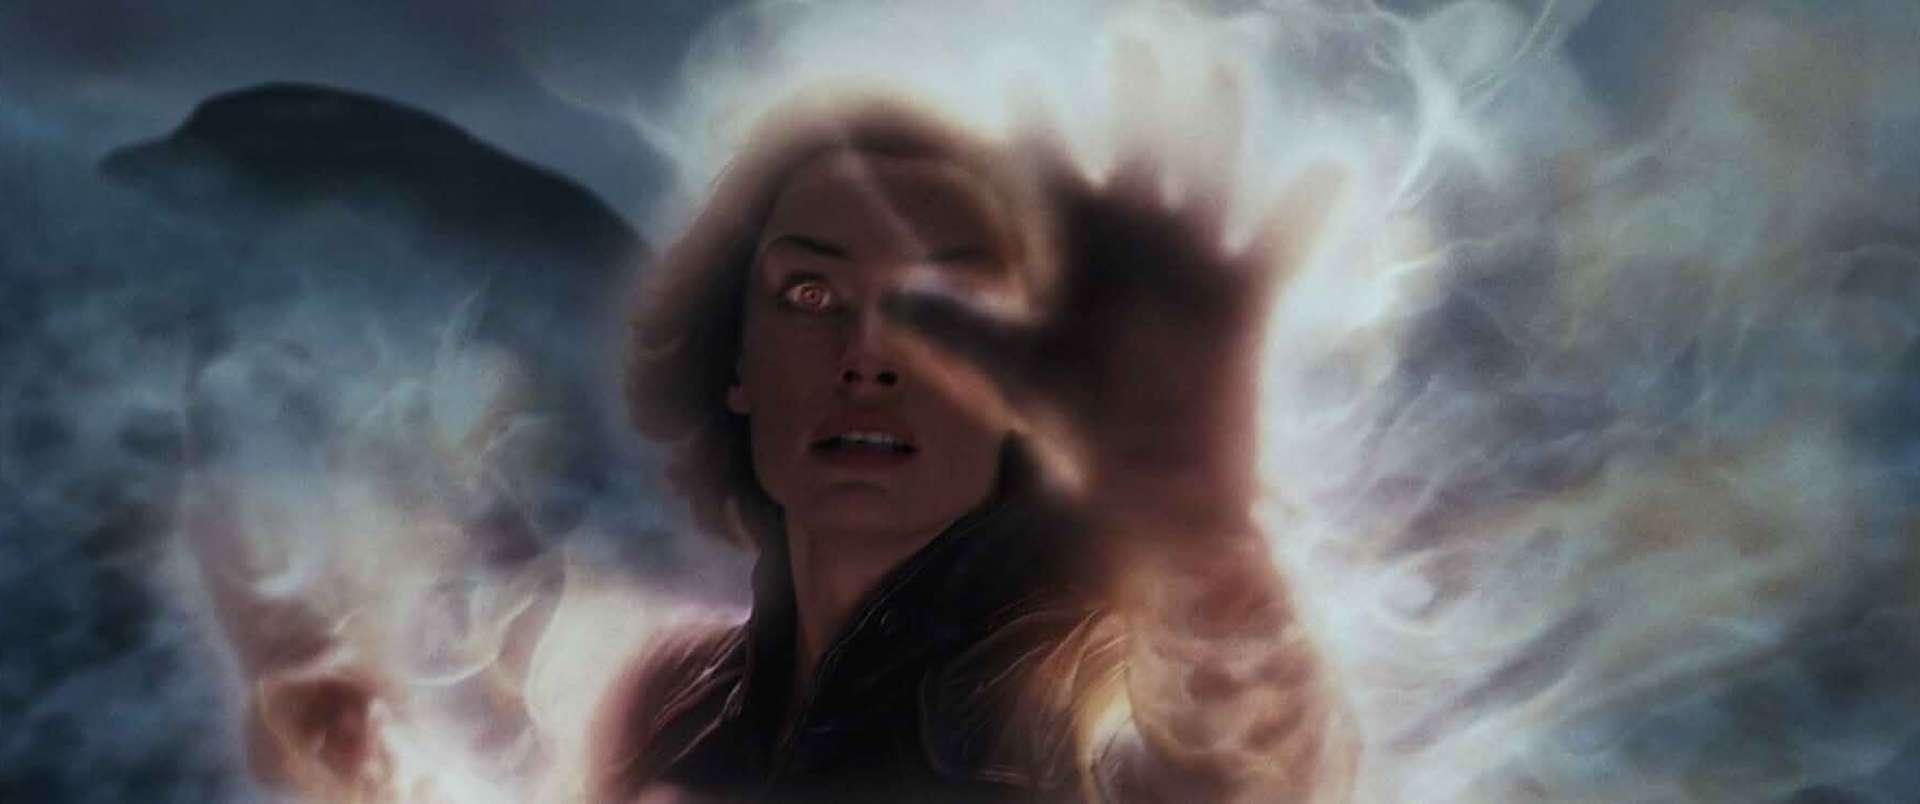 X-Men 2 Google Drive Link